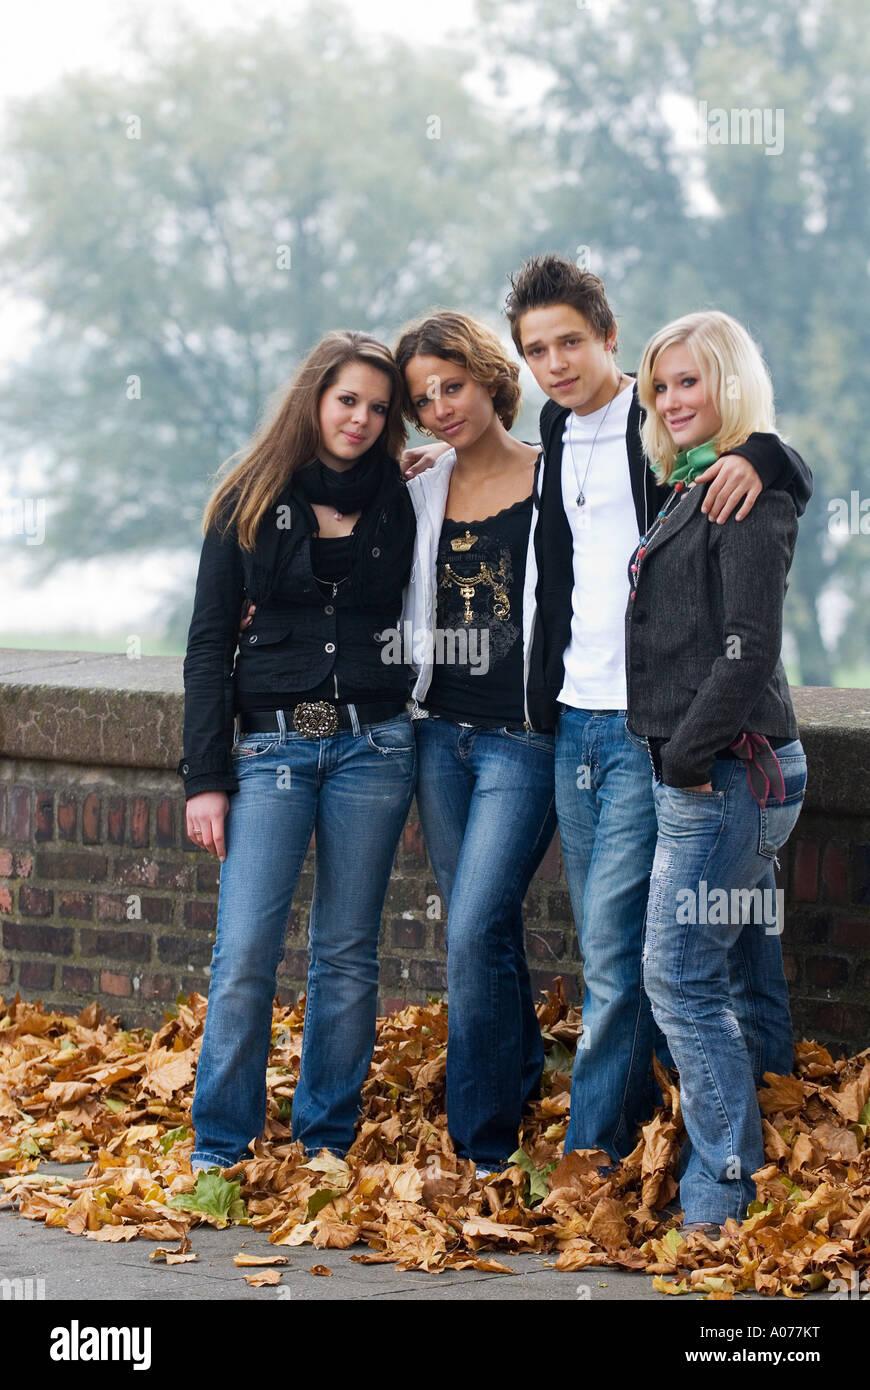 Трое девушек и парень фото фото 146-323